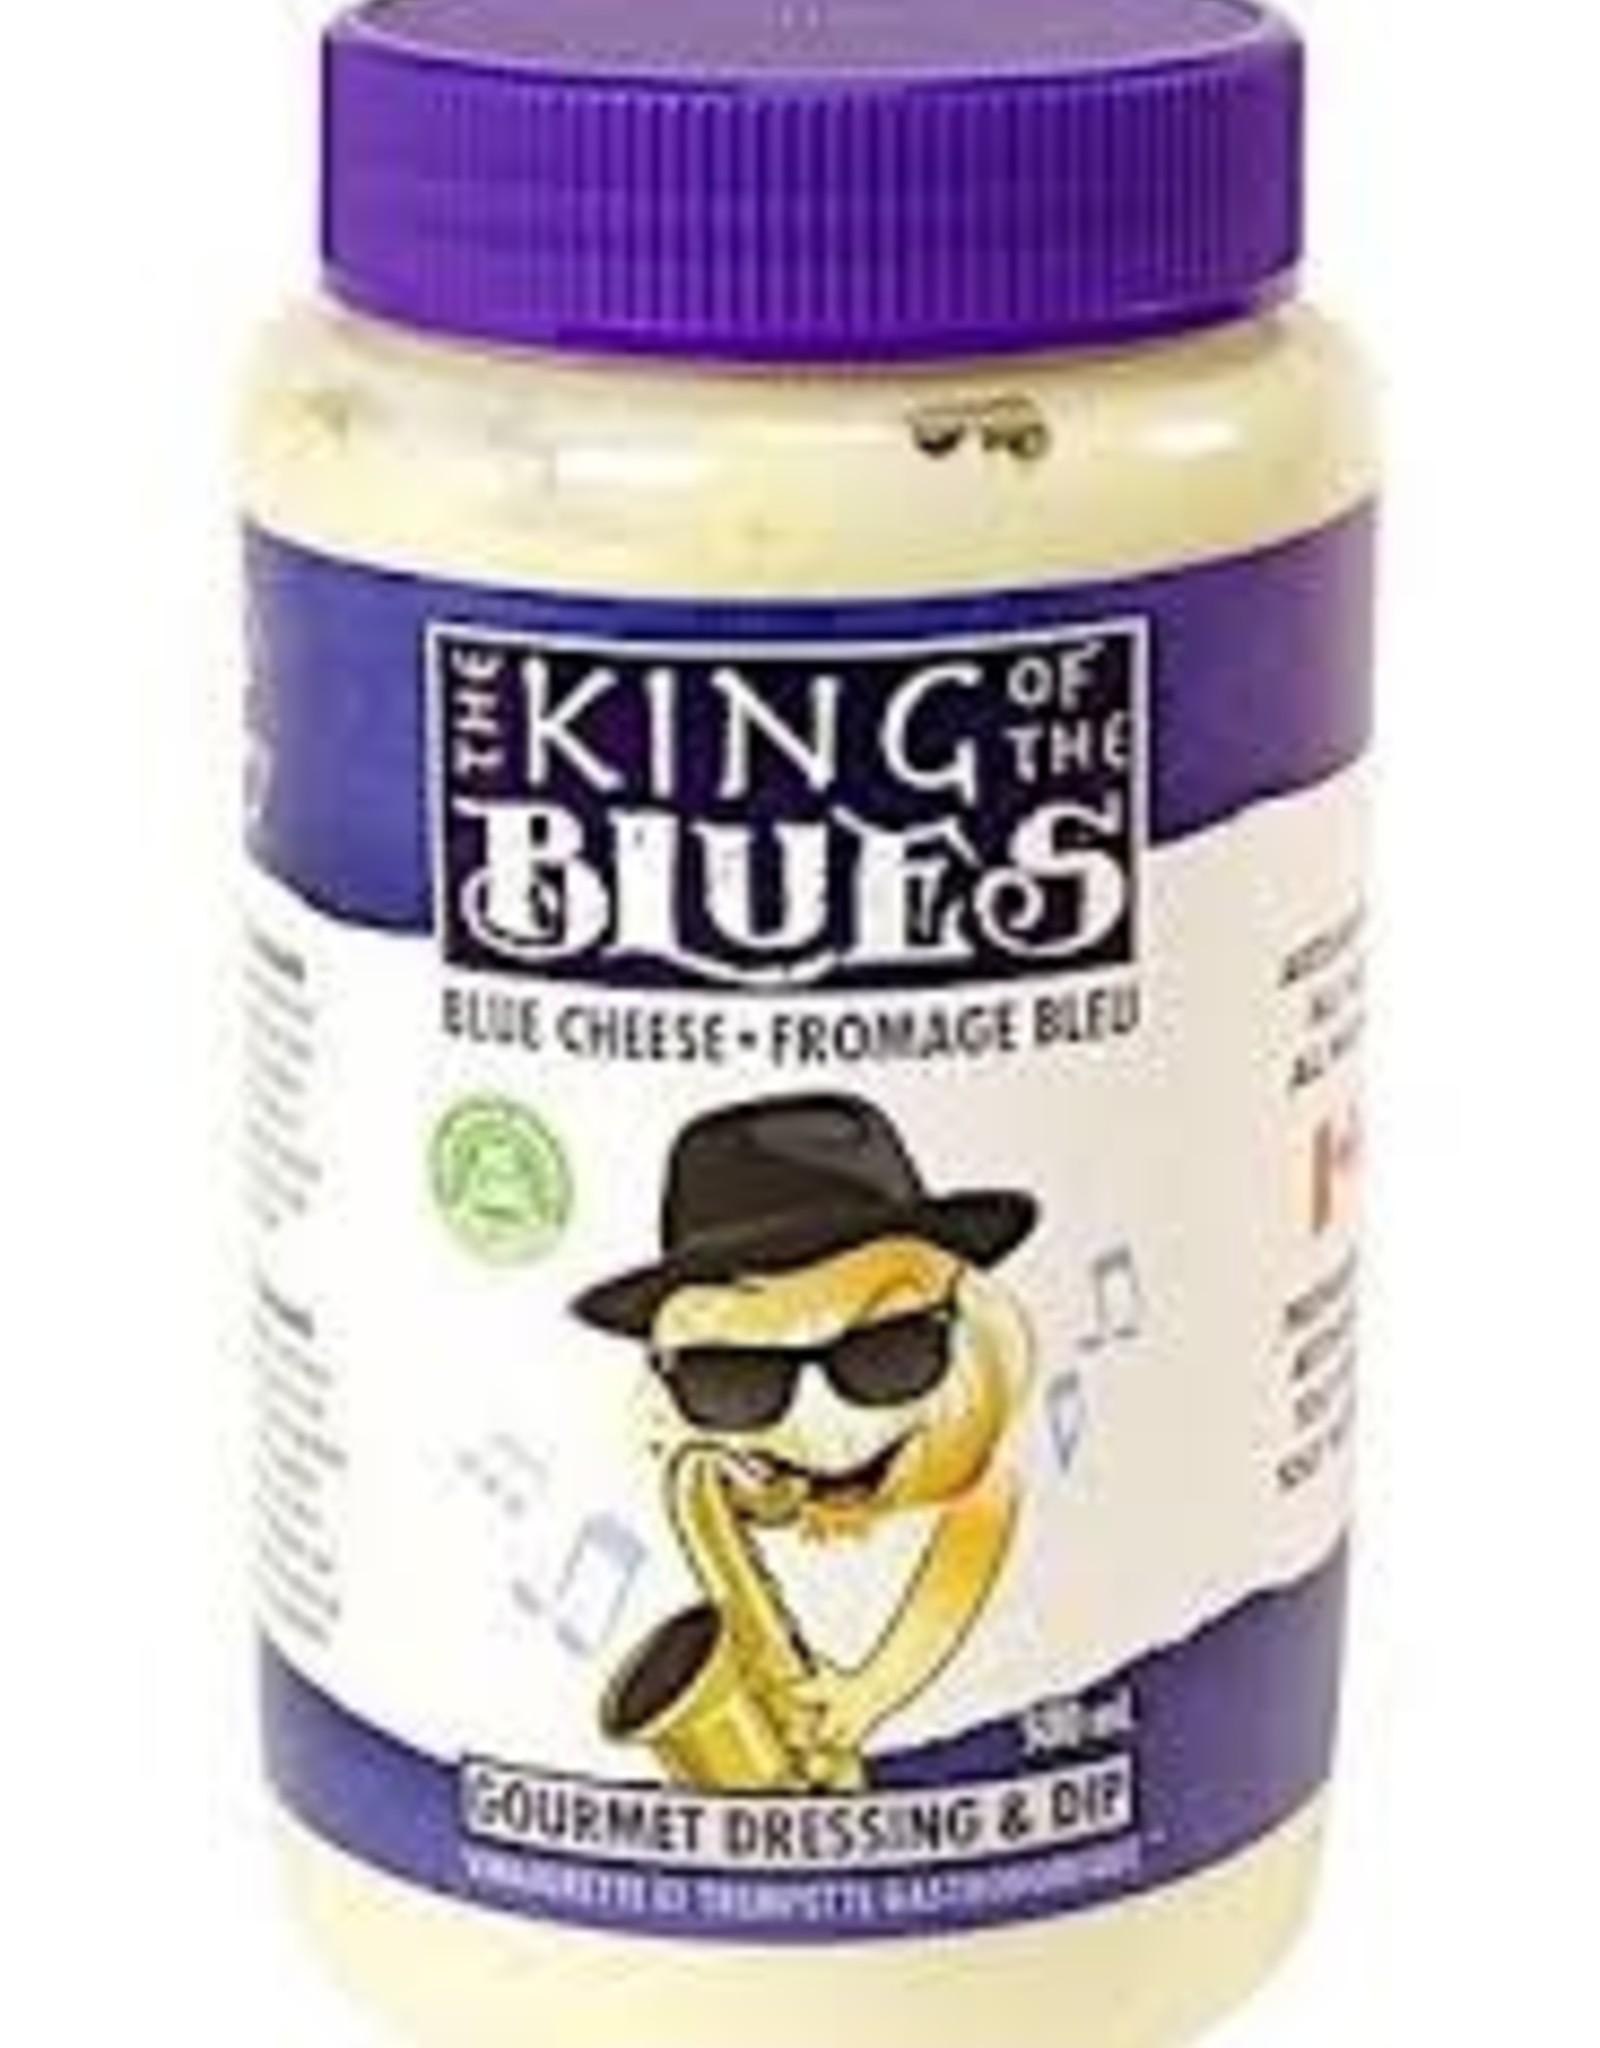 King of Caesars King of Caesars - Salad Dressing, Blue Cheese